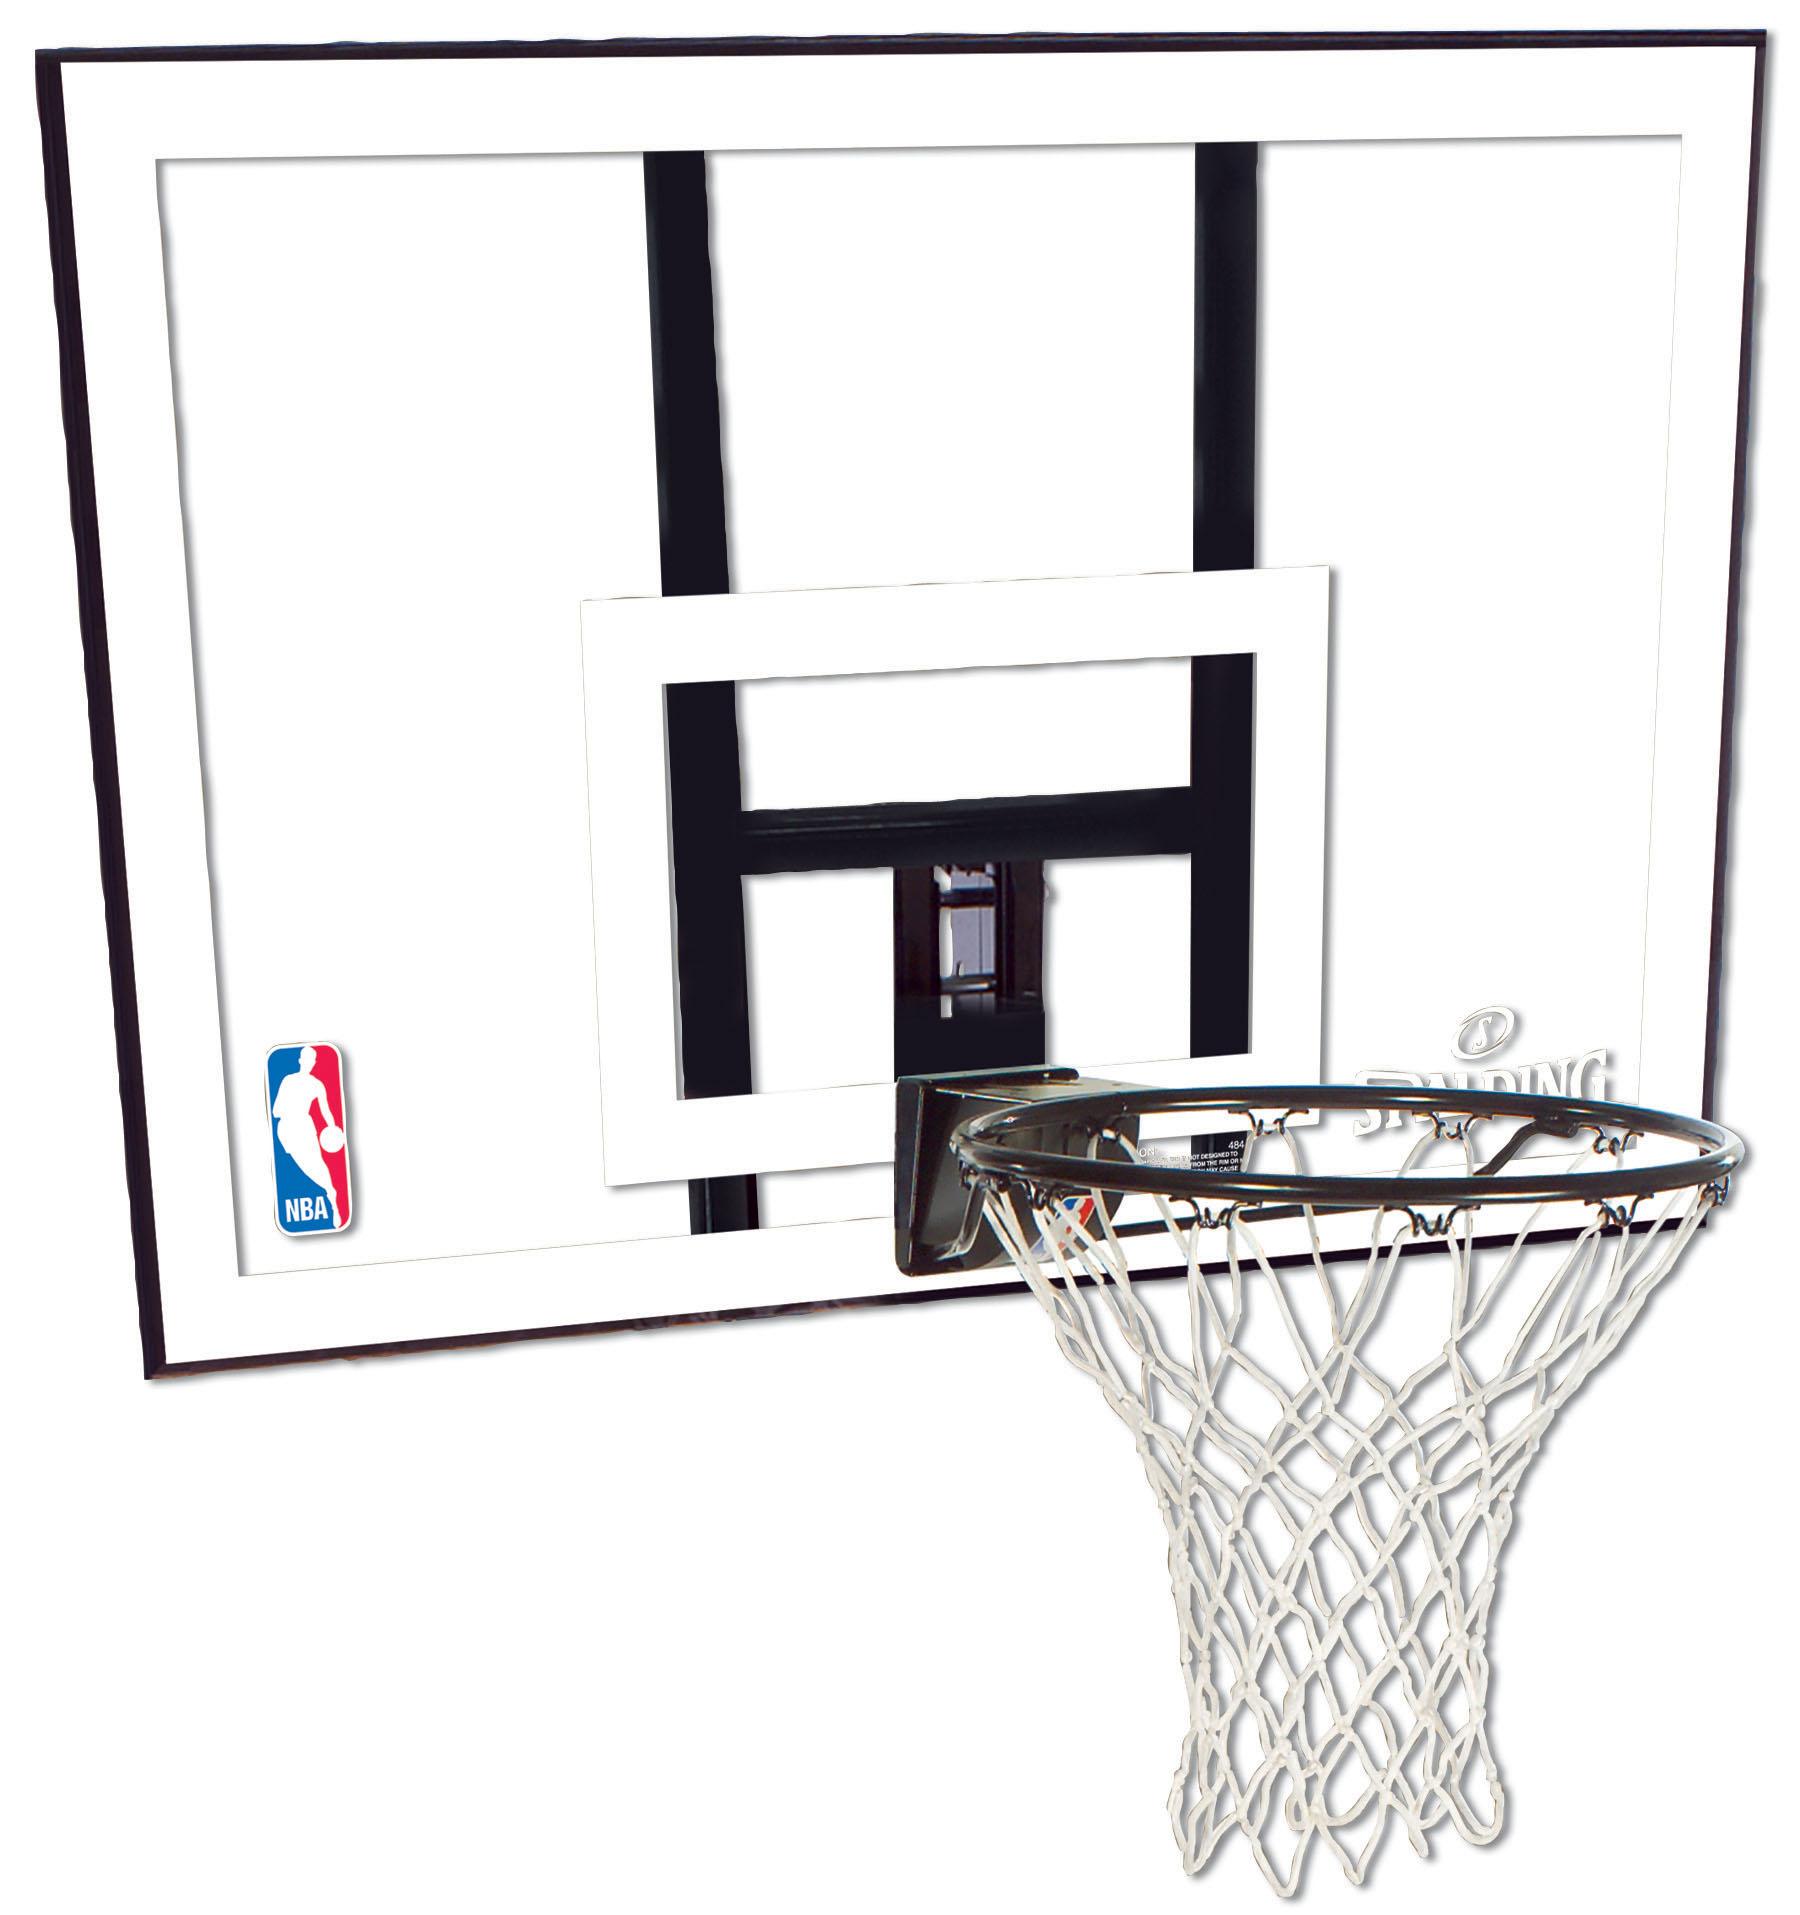 Spalding Баскетбольный щит NBA Combo 44 Acrylic